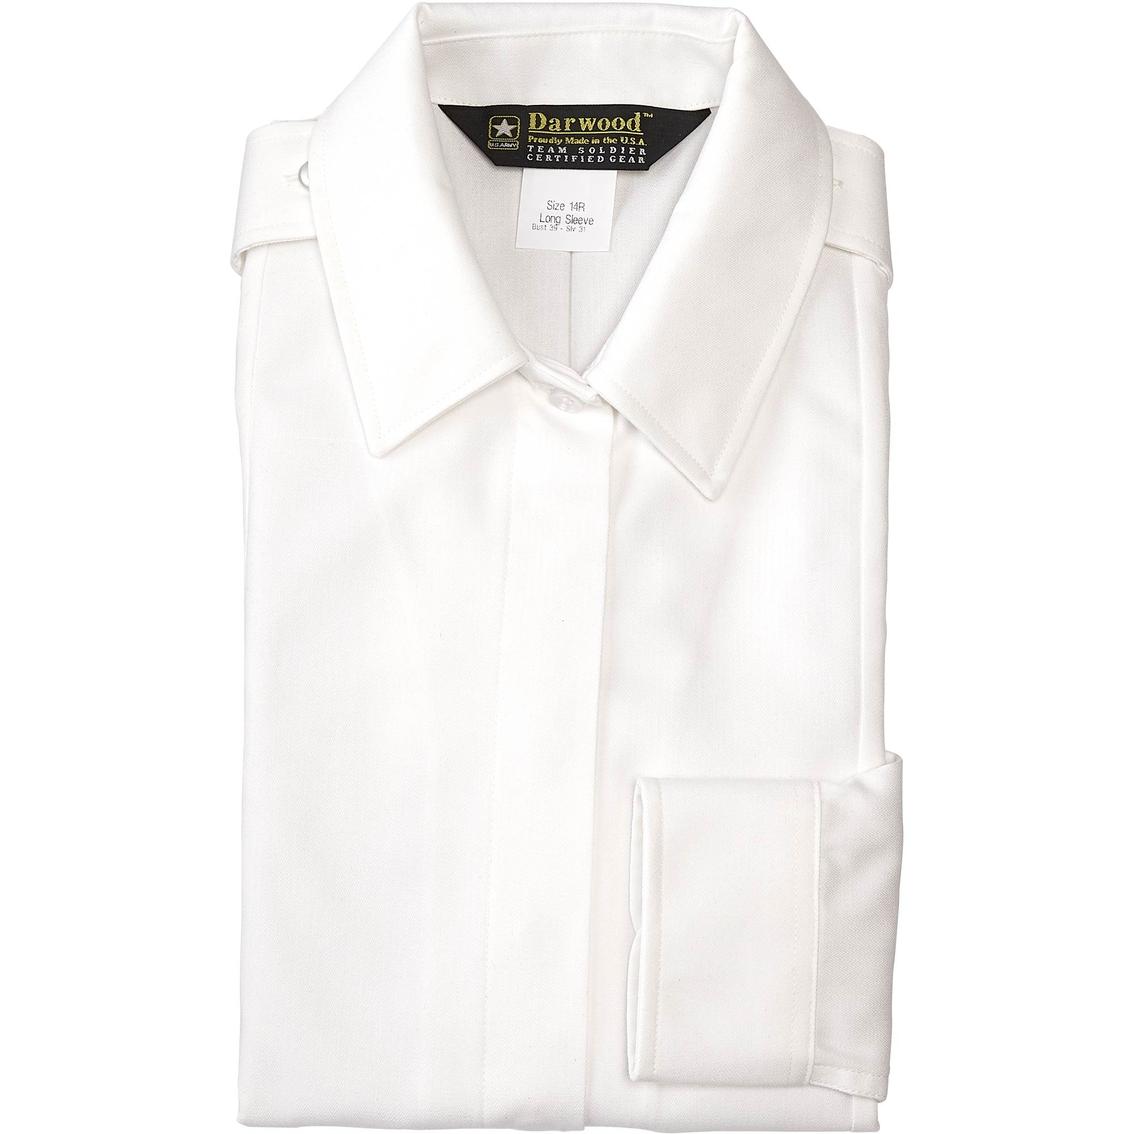 b58f2c0f Army Women's White Placket Long Sleeve Blouse (asu) | Shirts ...